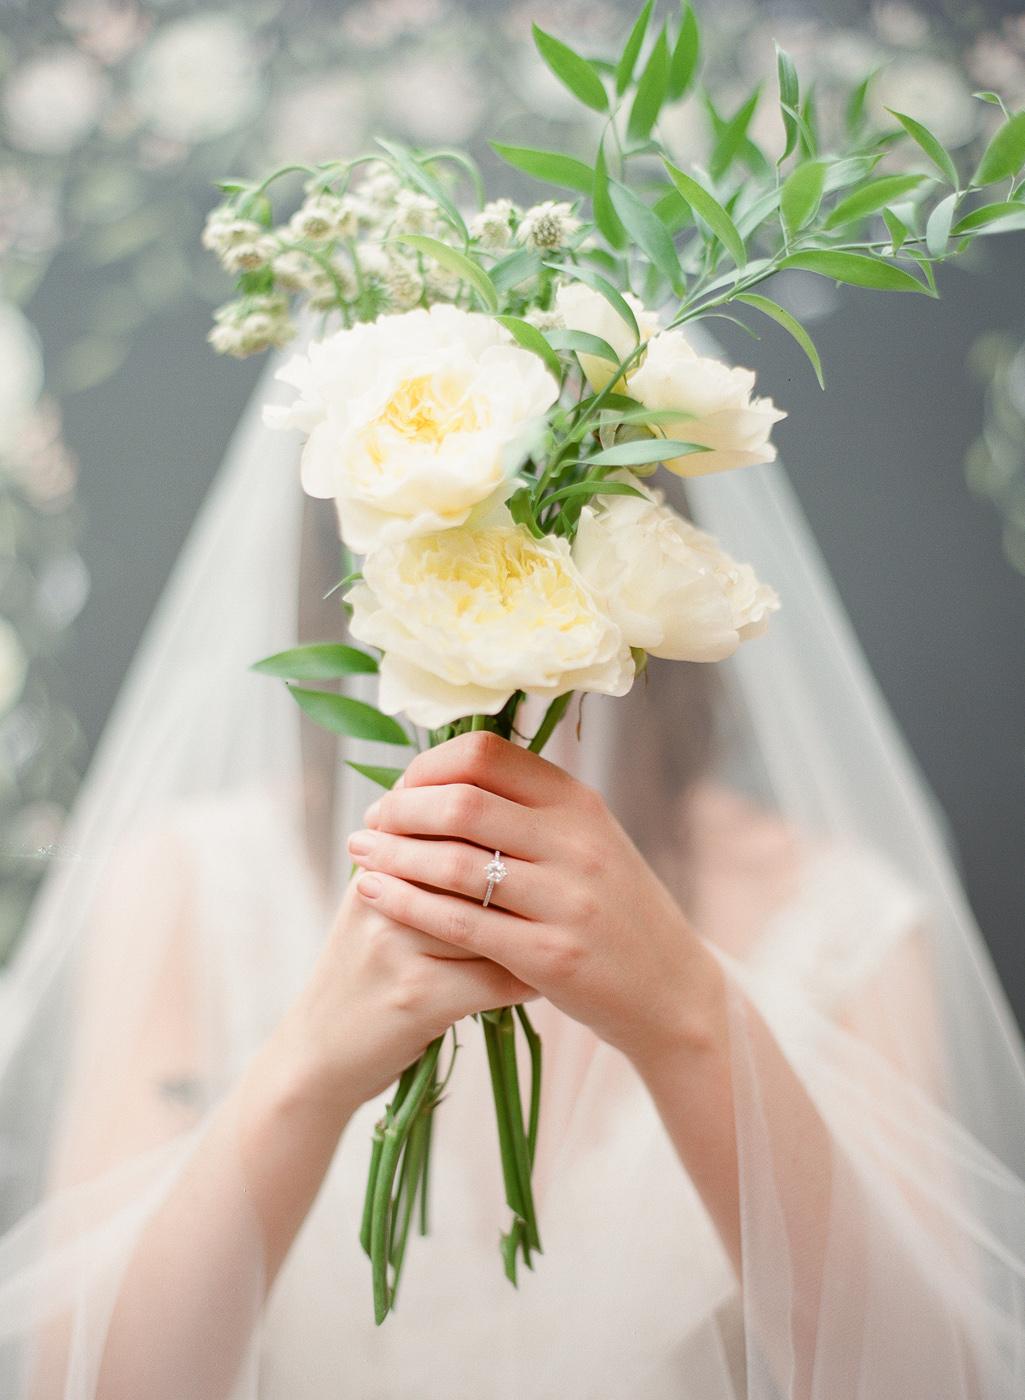 wedding flowers lindsay rae design